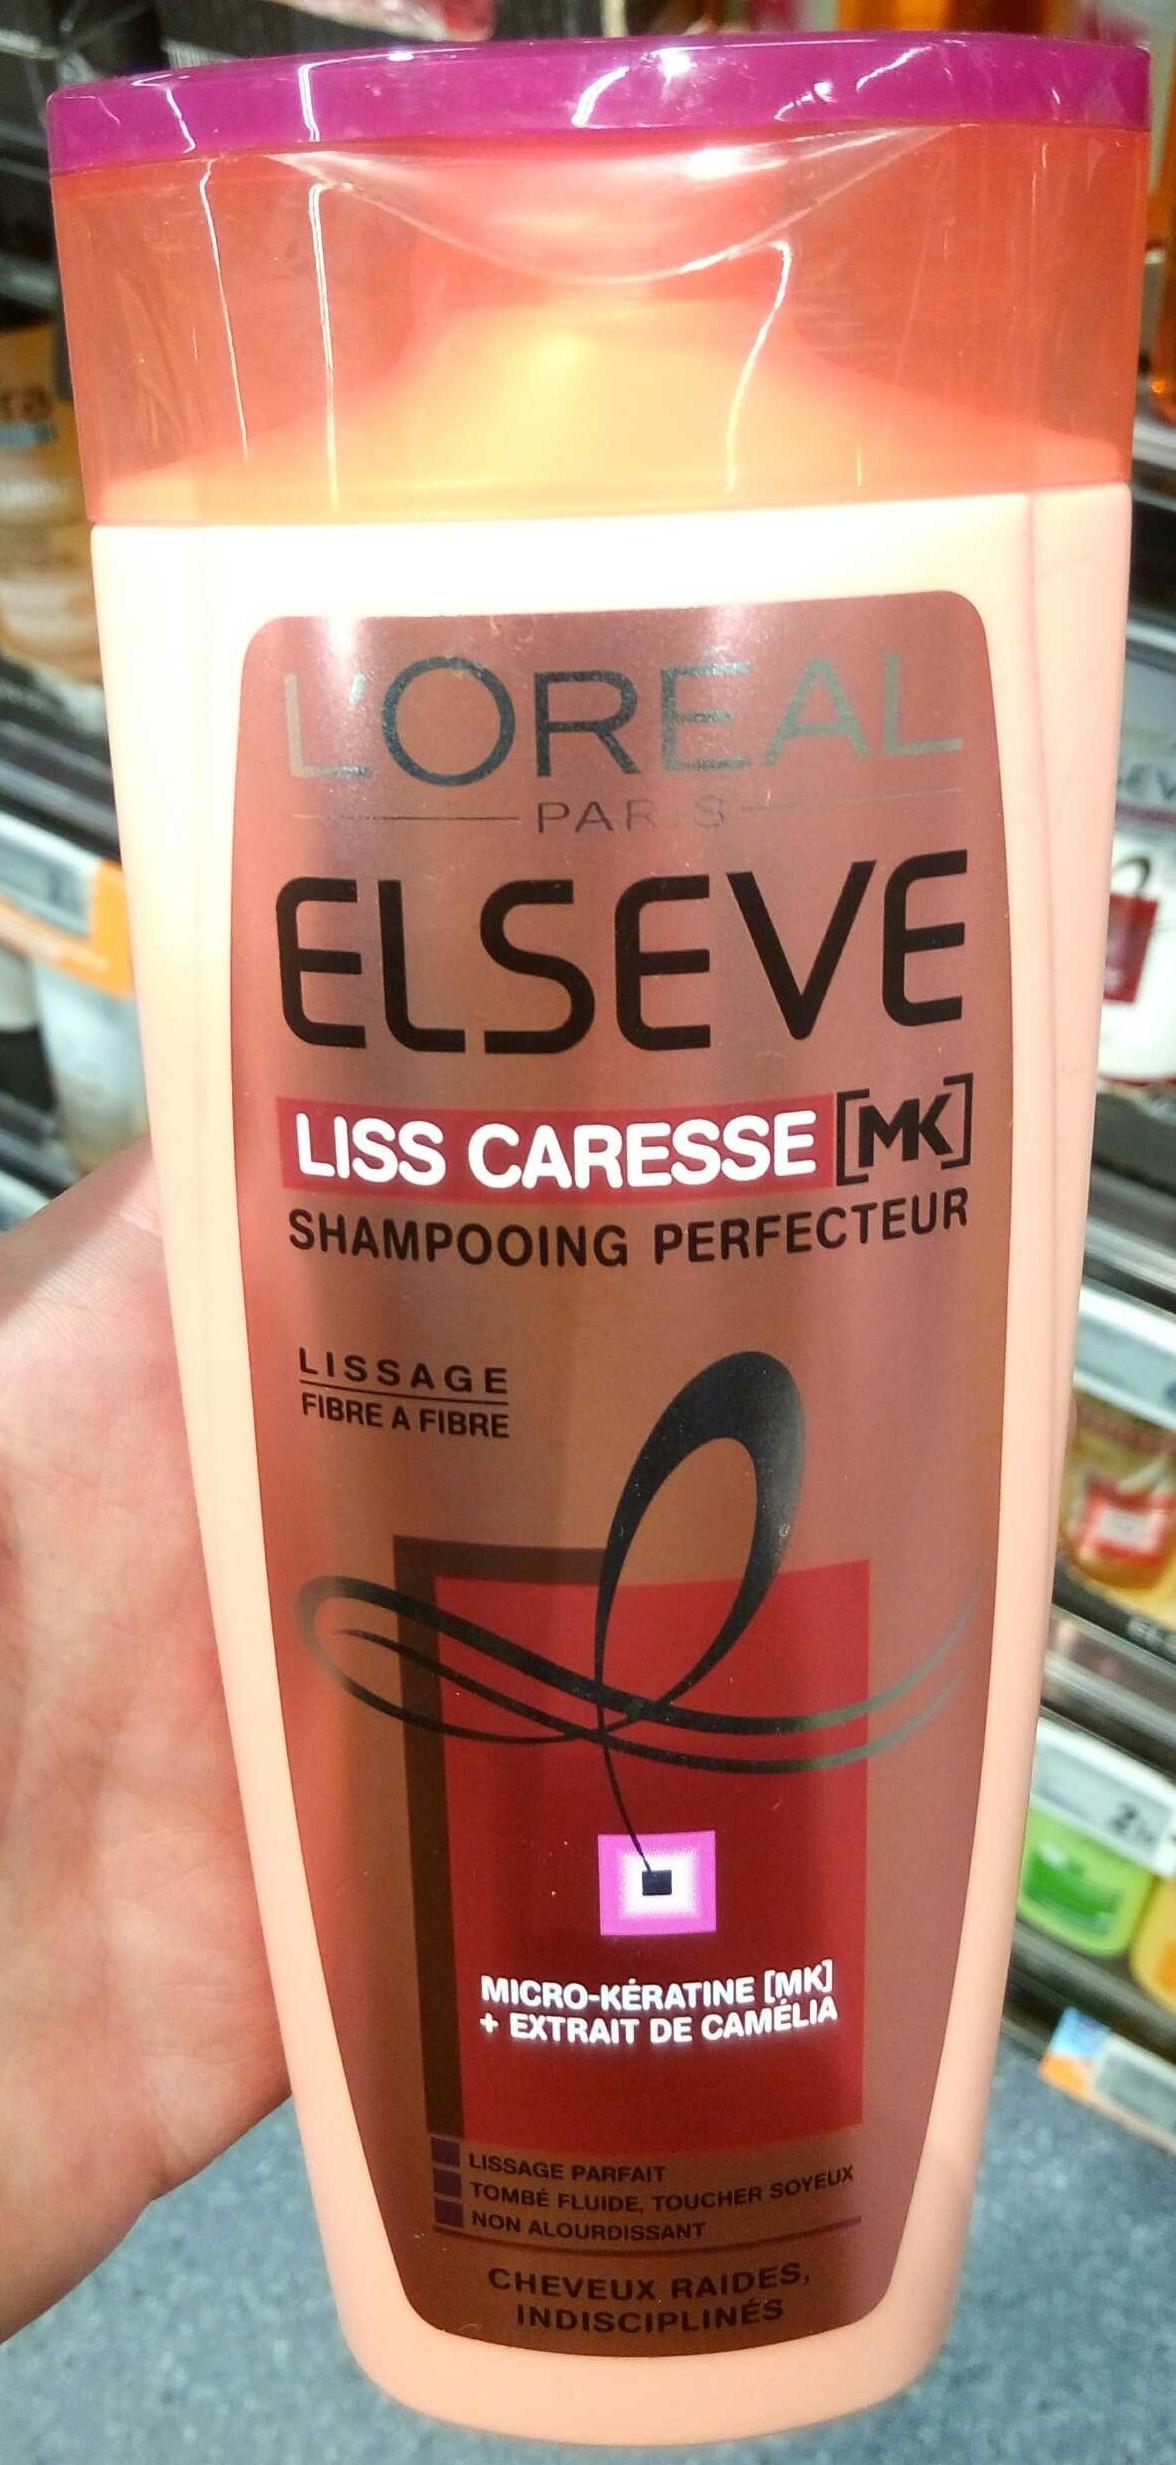 Elseve Liss Caresse [MK] Shampooing perfecteur - Product - fr